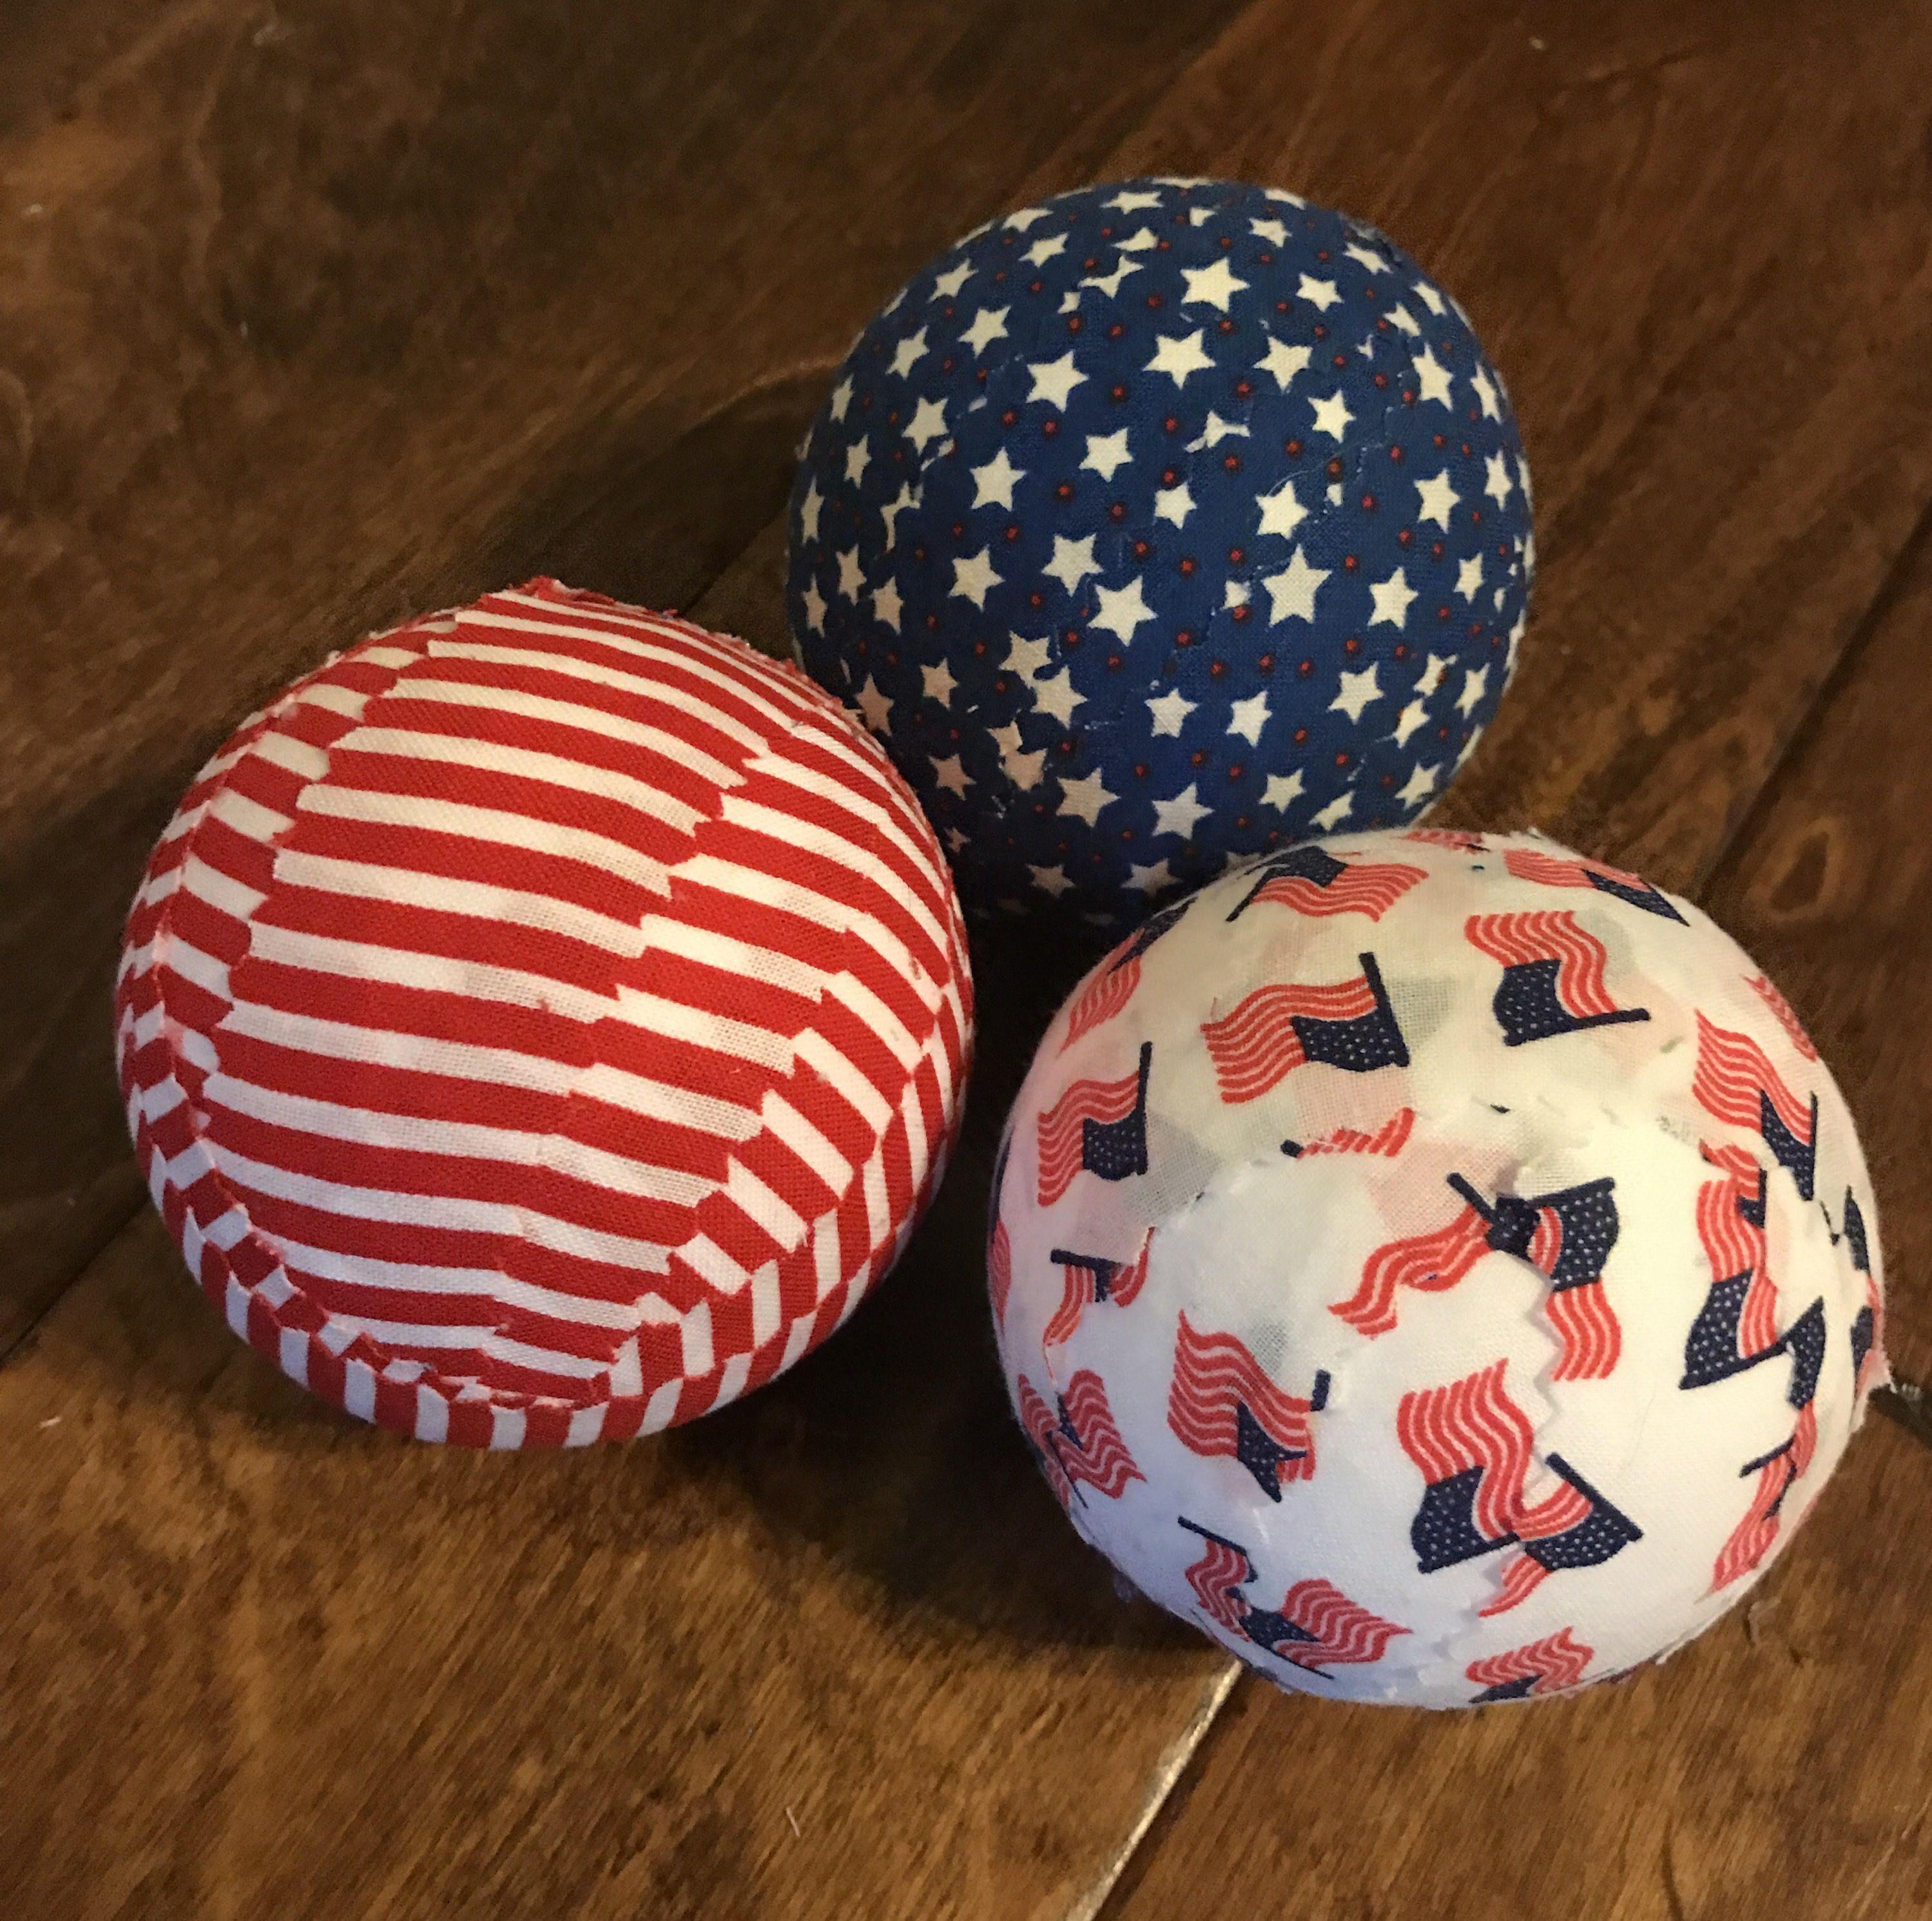 Patriotic Red White Cream Blue Stars Decorative Fabric Balls Orbs Bowl Filler Set Of 6 In 2020 Fabric Decor Fabric Balls Fourth Of July Decor